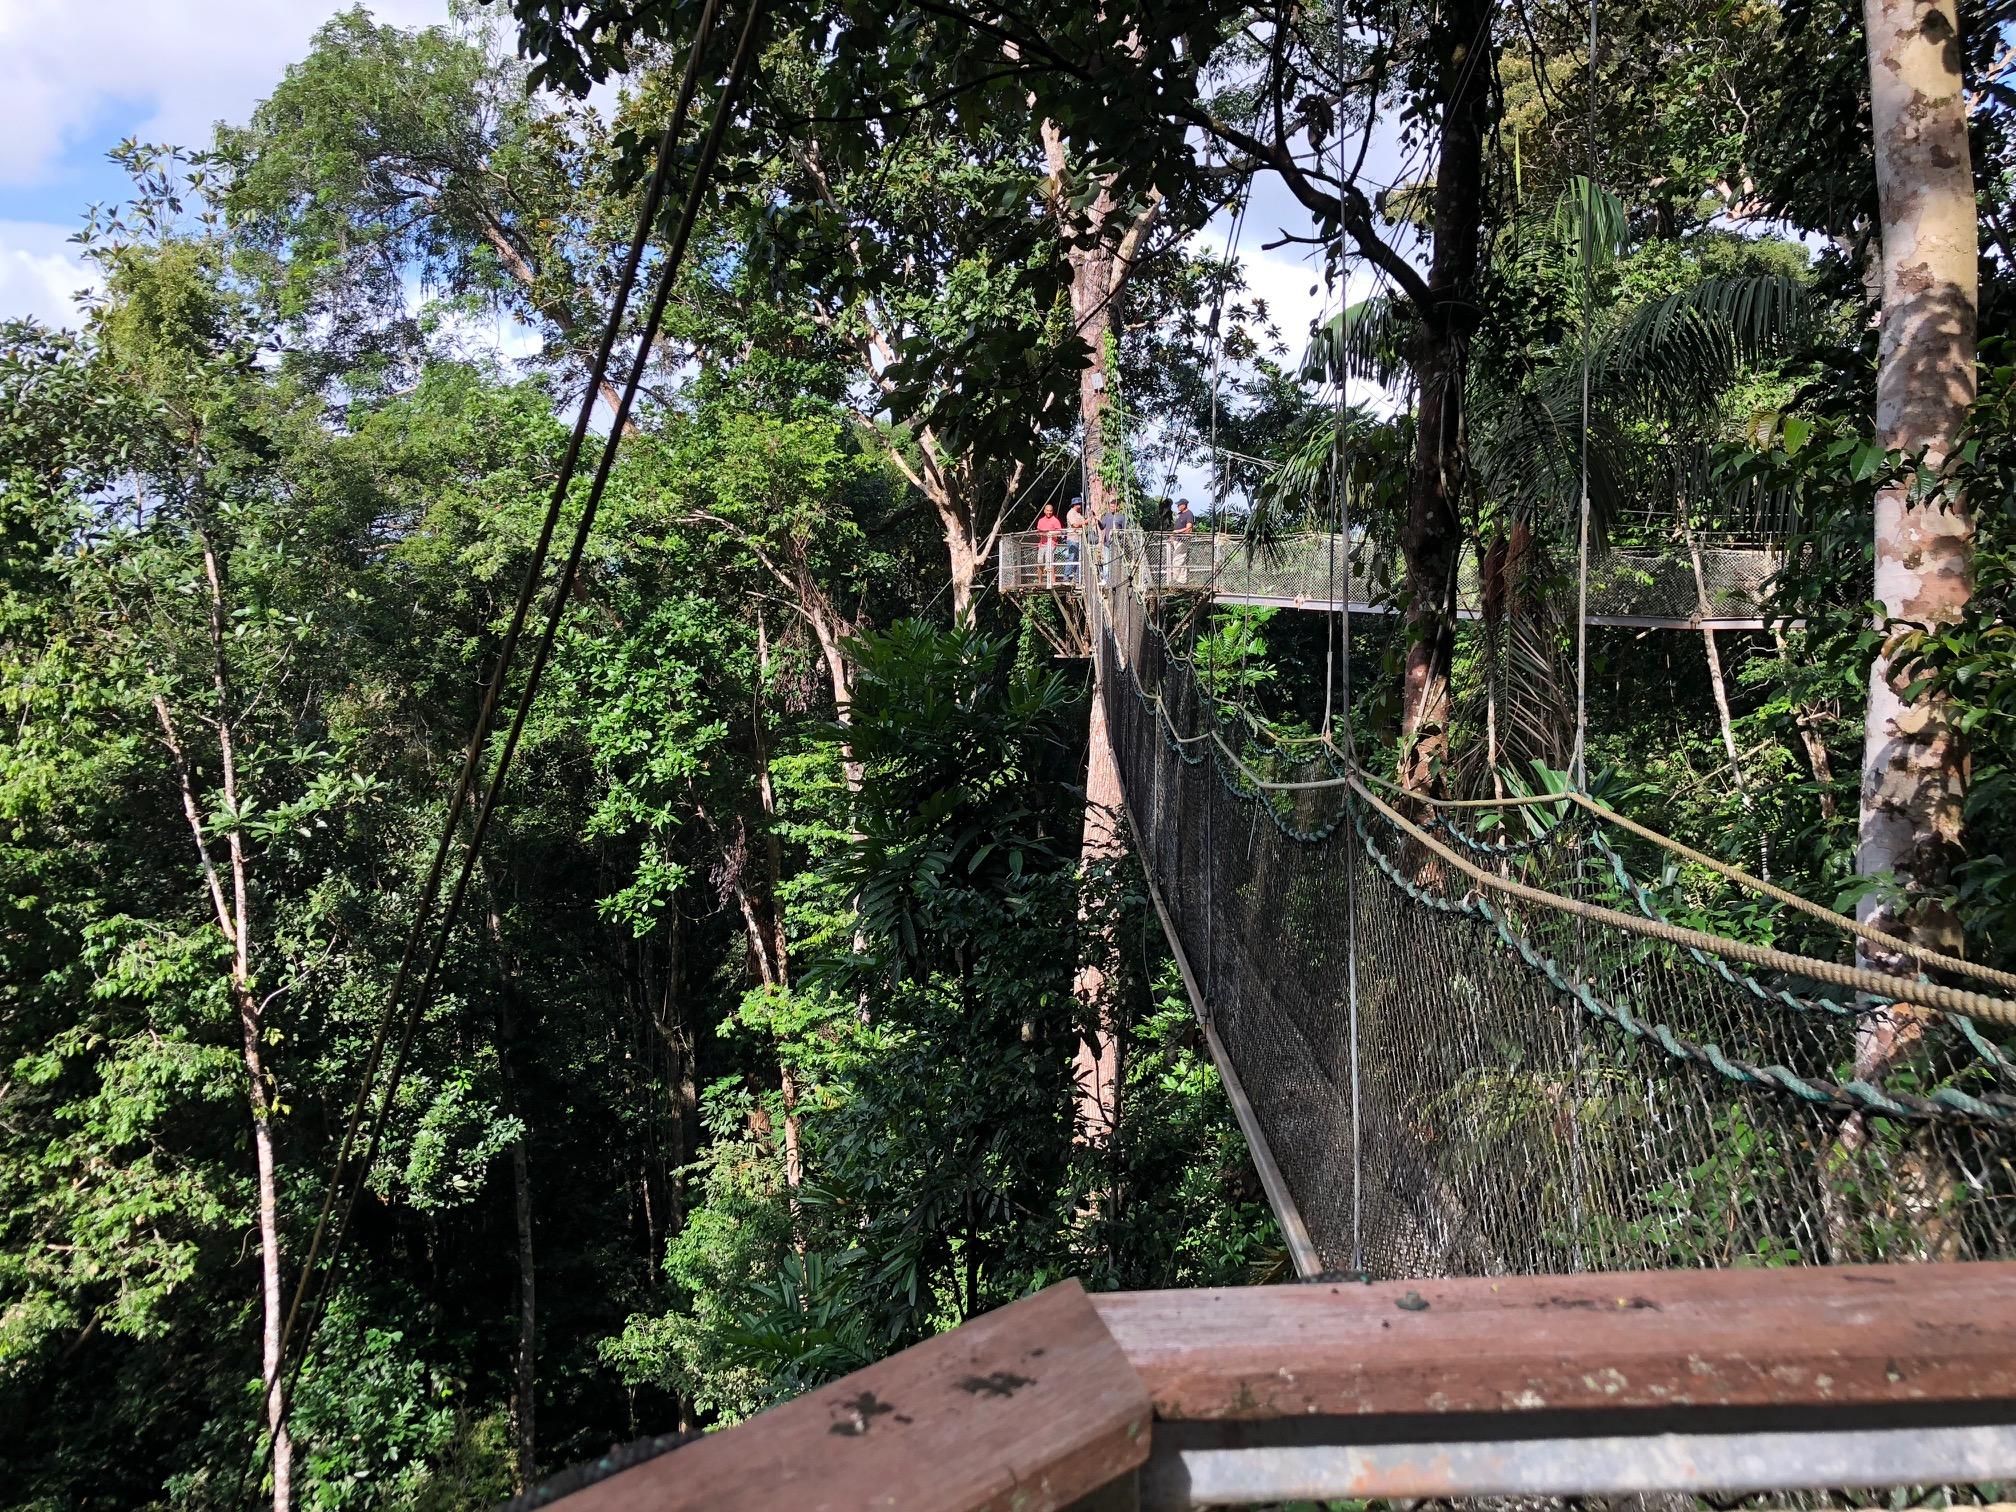 Iwokrama Canopy Walkway 2 & Iwokrama Canopy Walkway Guyana - Bookmarks u0026 Waypoints